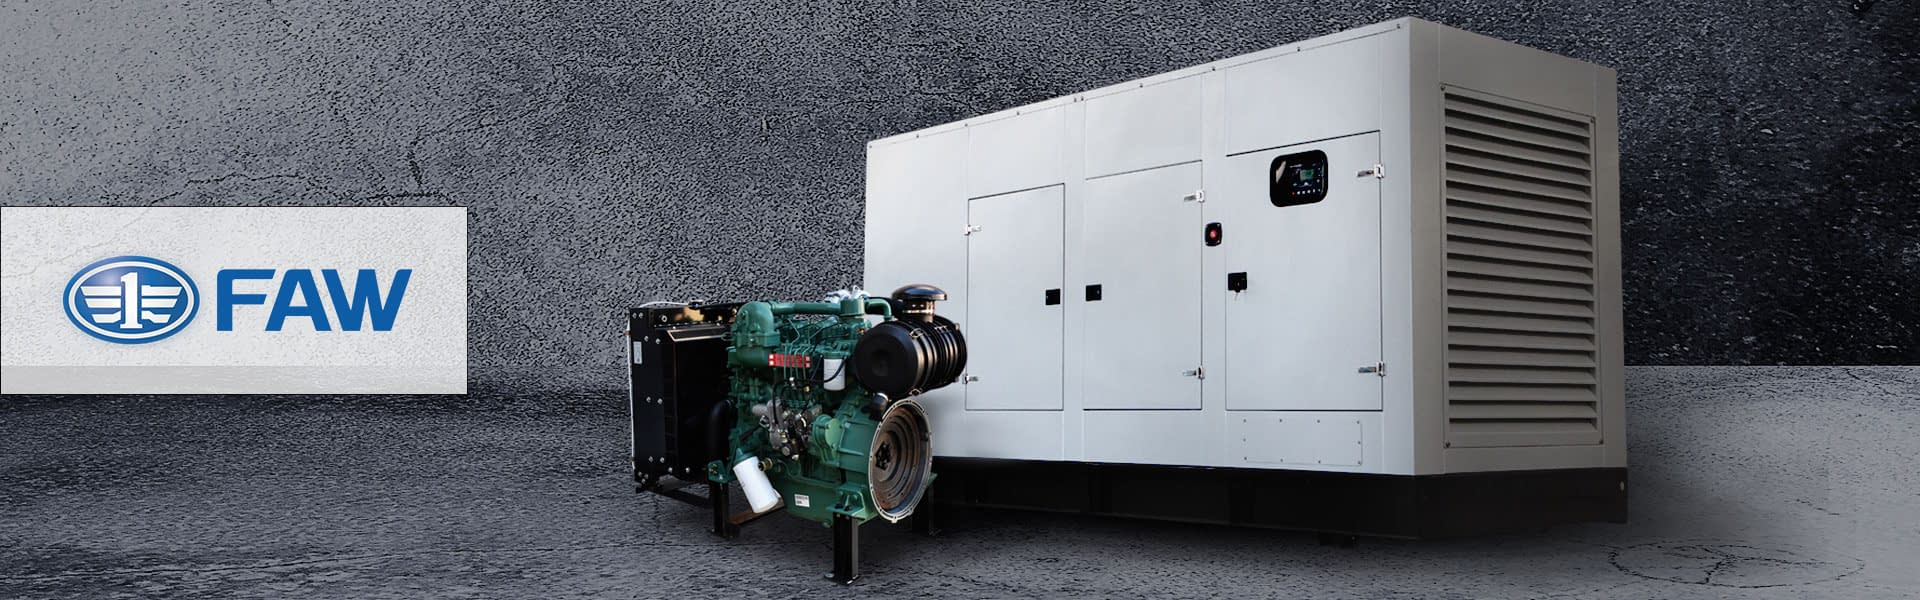 FAW Diesel Generator for Sale | FAW Generator South Africa | Generator King